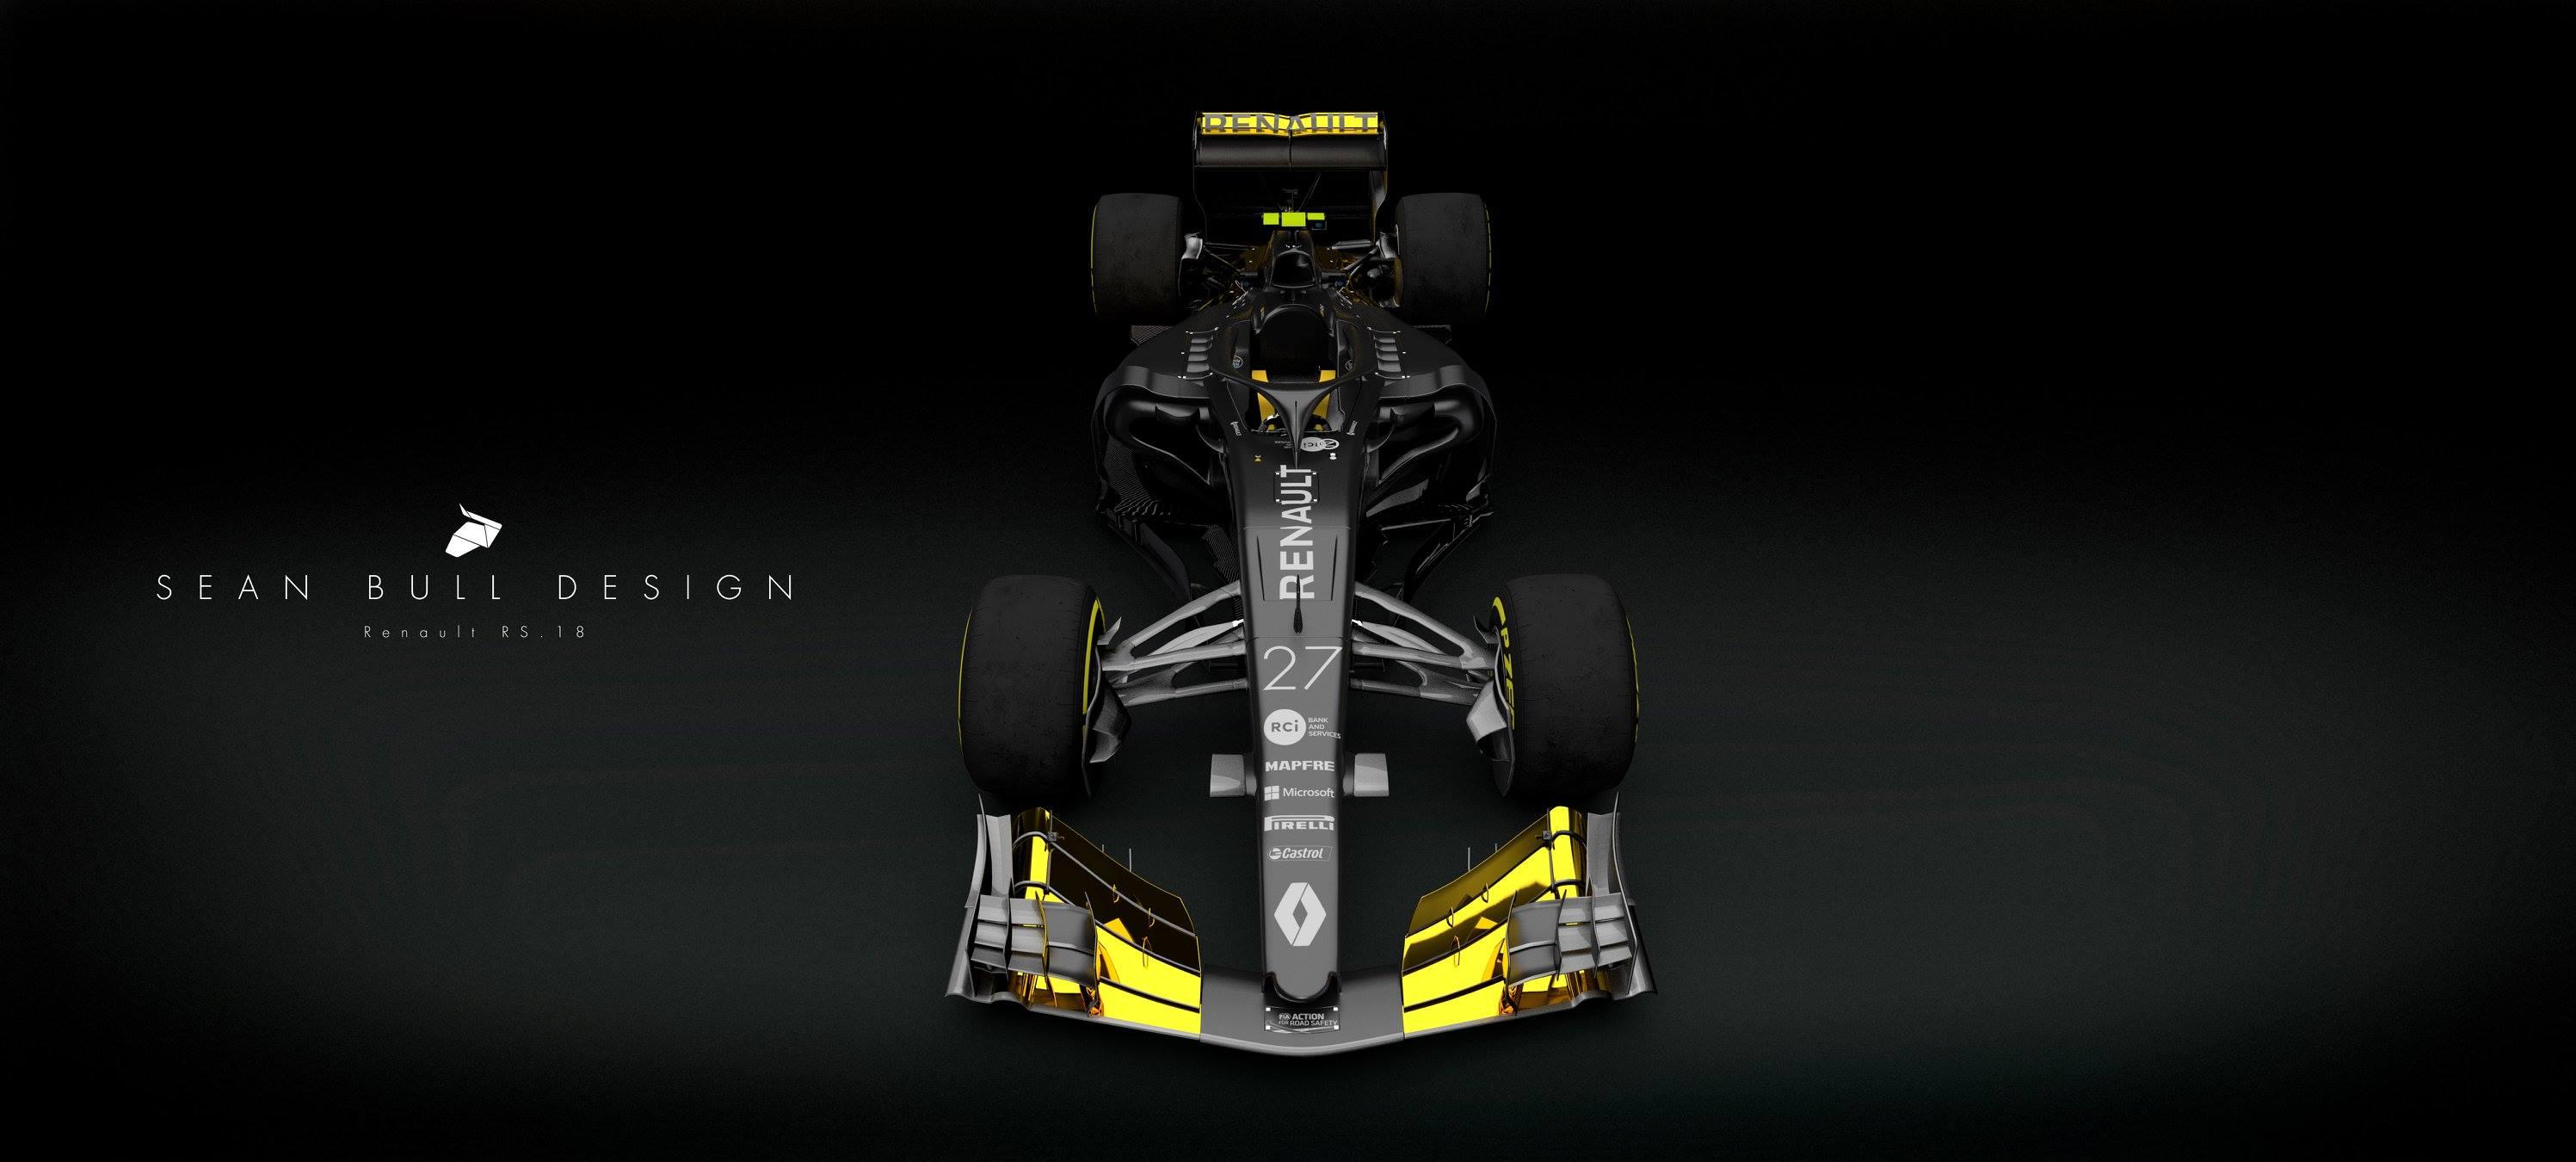 2018-Renault-F1-Car-Concept-Design-Top